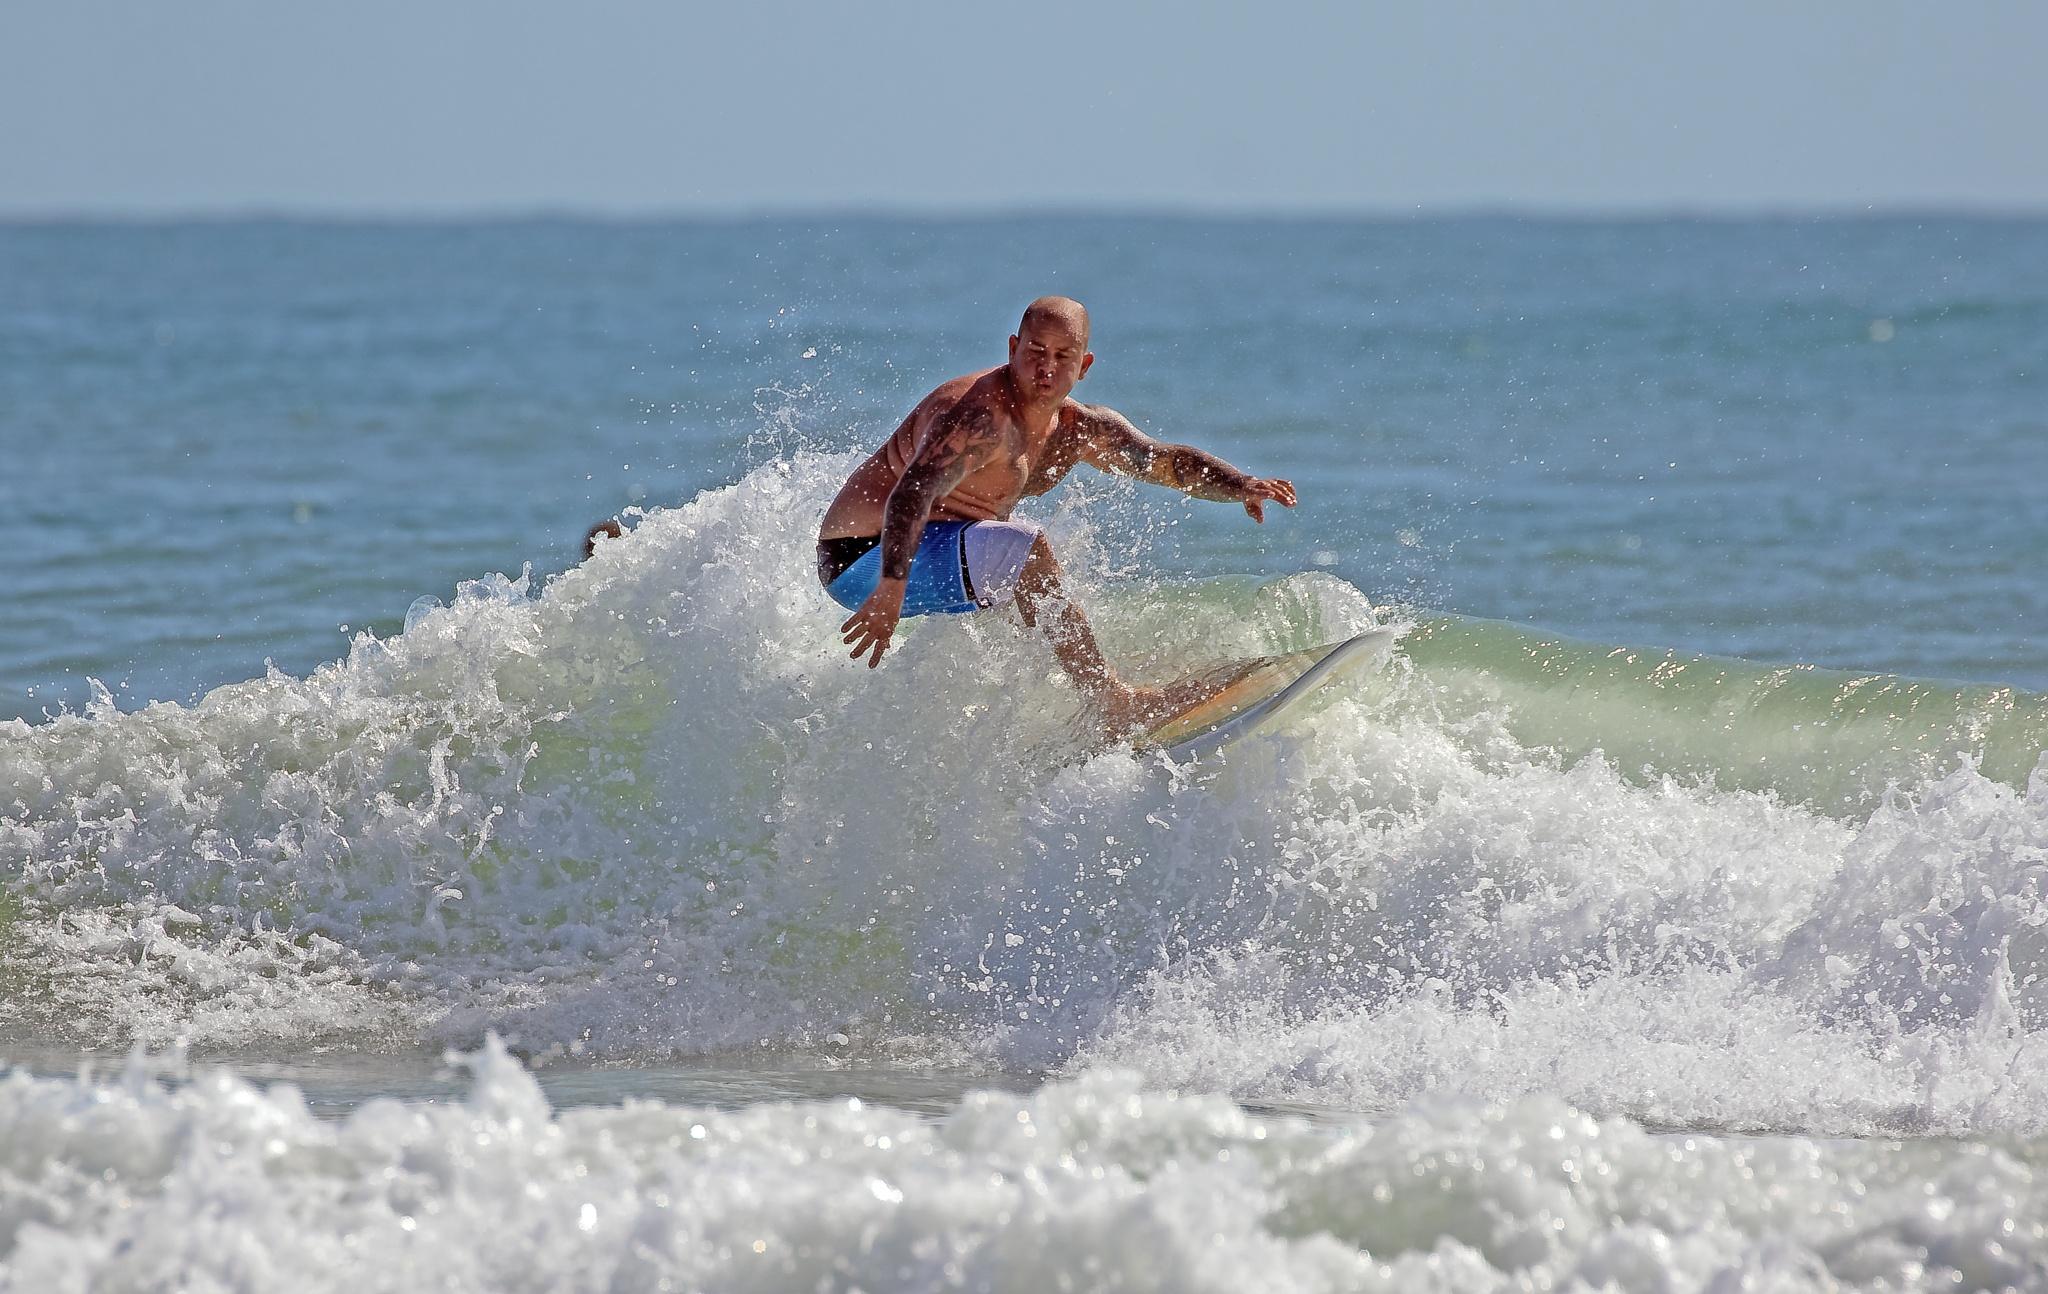 Surfs Up by Barry Melamed